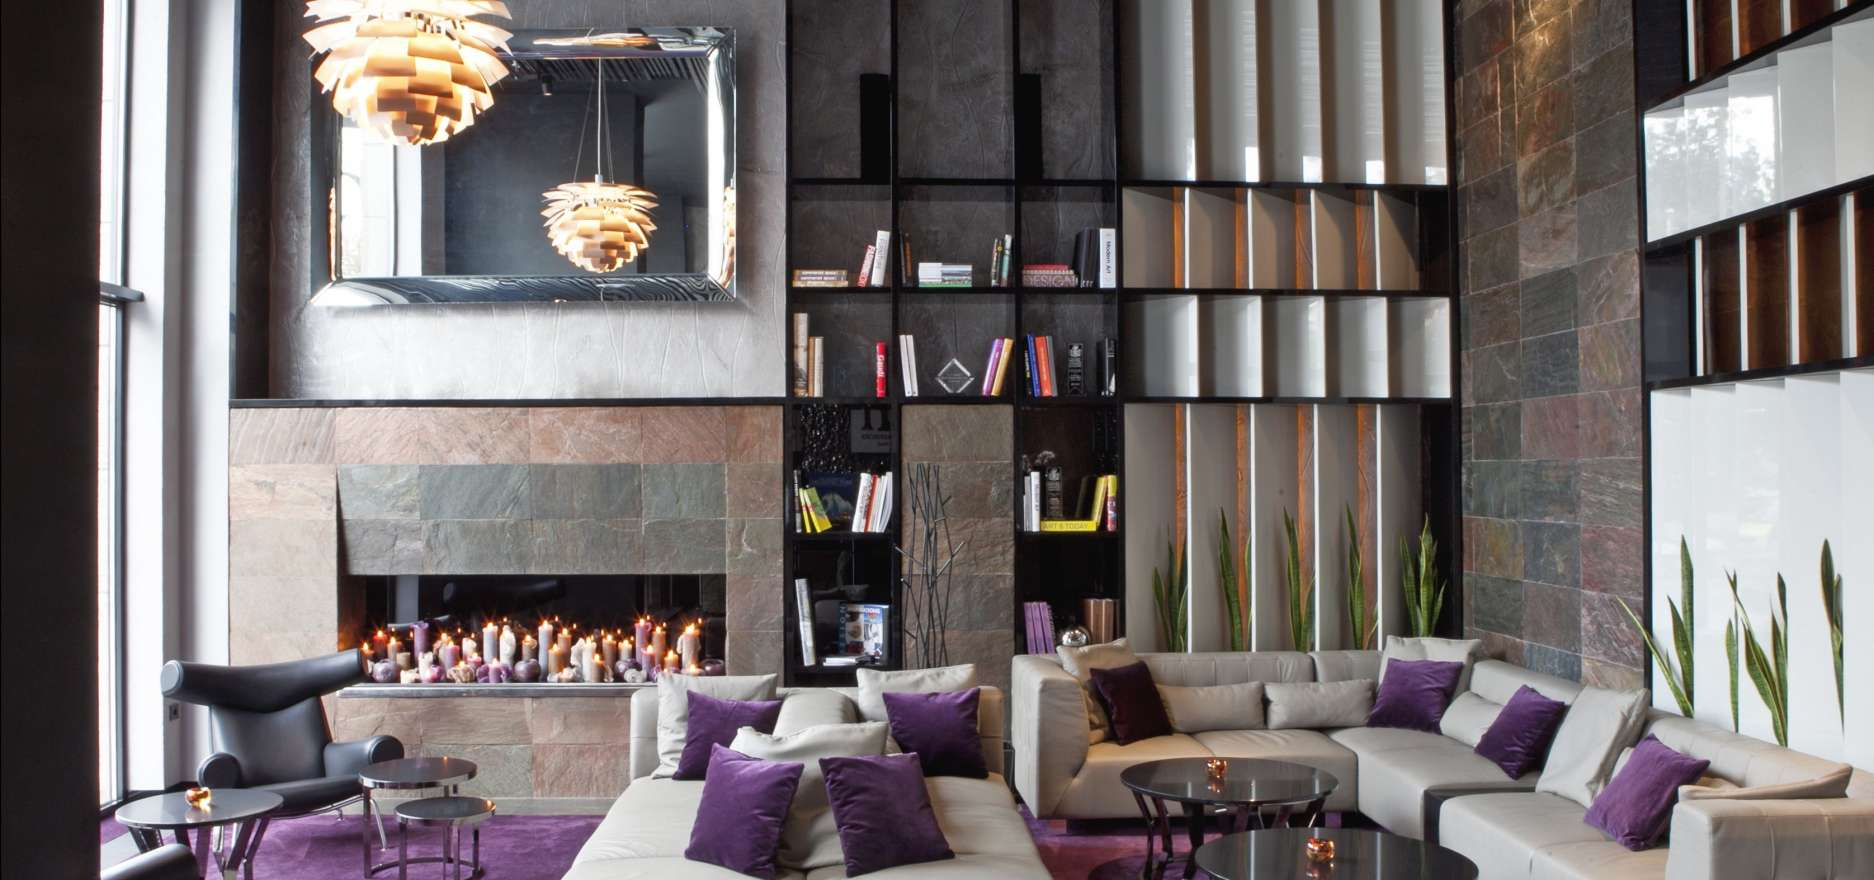 11 mirrors design hotel for Gunstige designhotels